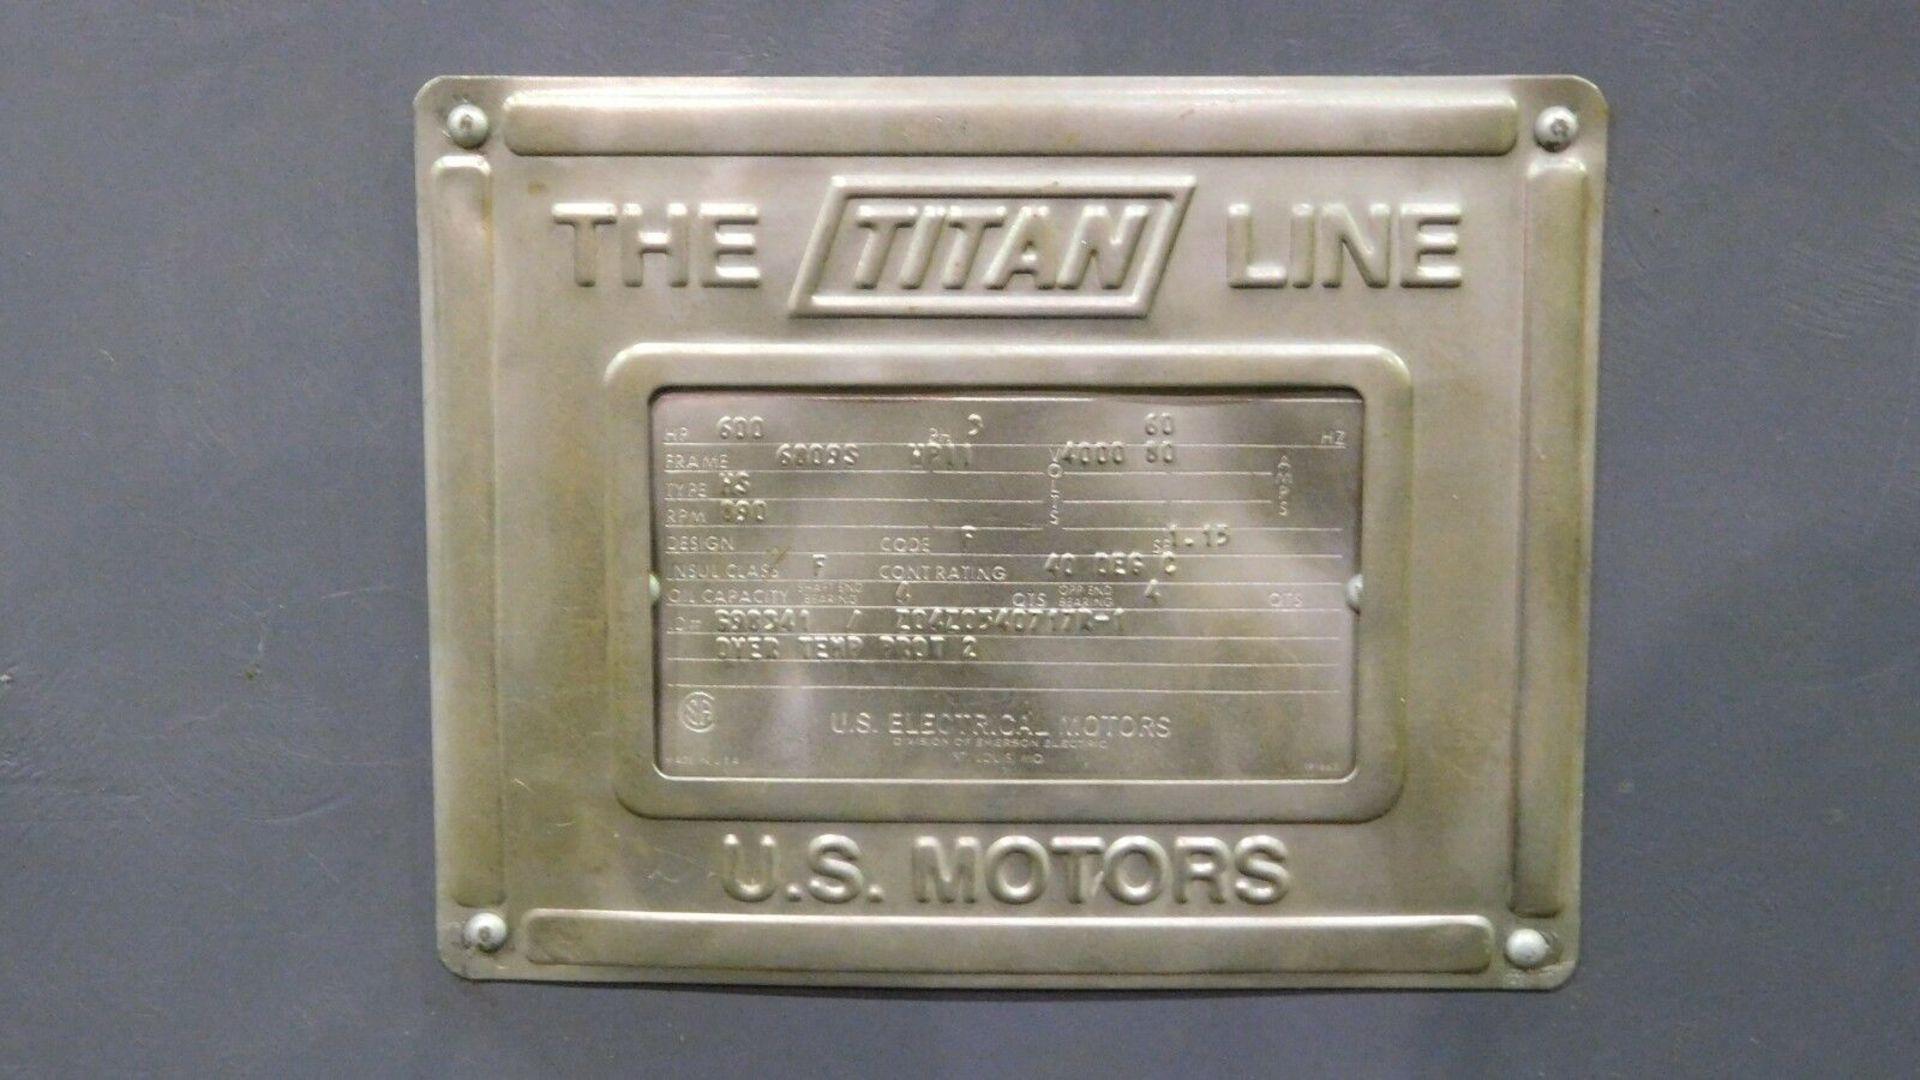 US Motors 600 HP Electric Motor. 890 RPM. 4000 V. 6809S. Type MS. 60 Hz. 3 Ph. - Image 5 of 5